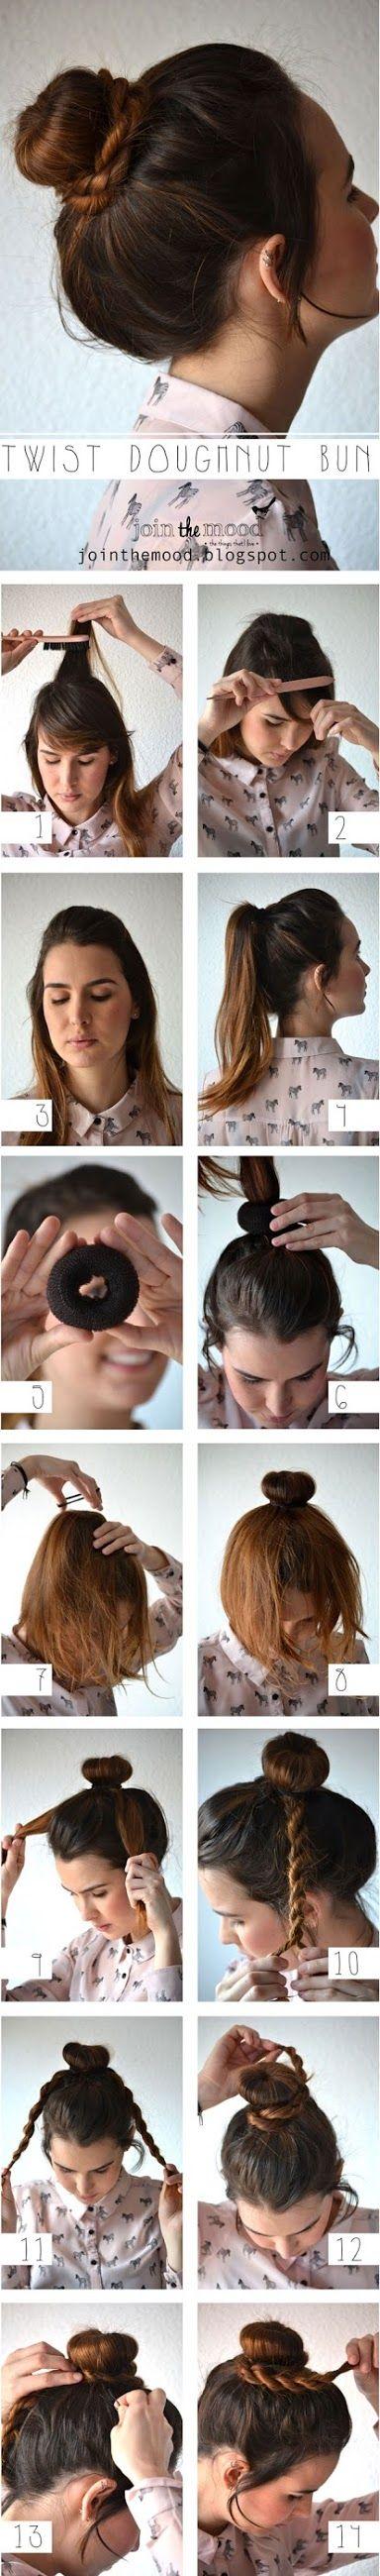 How To Make Twist Doughnut Bun For Your Hair | Shes Beautiful